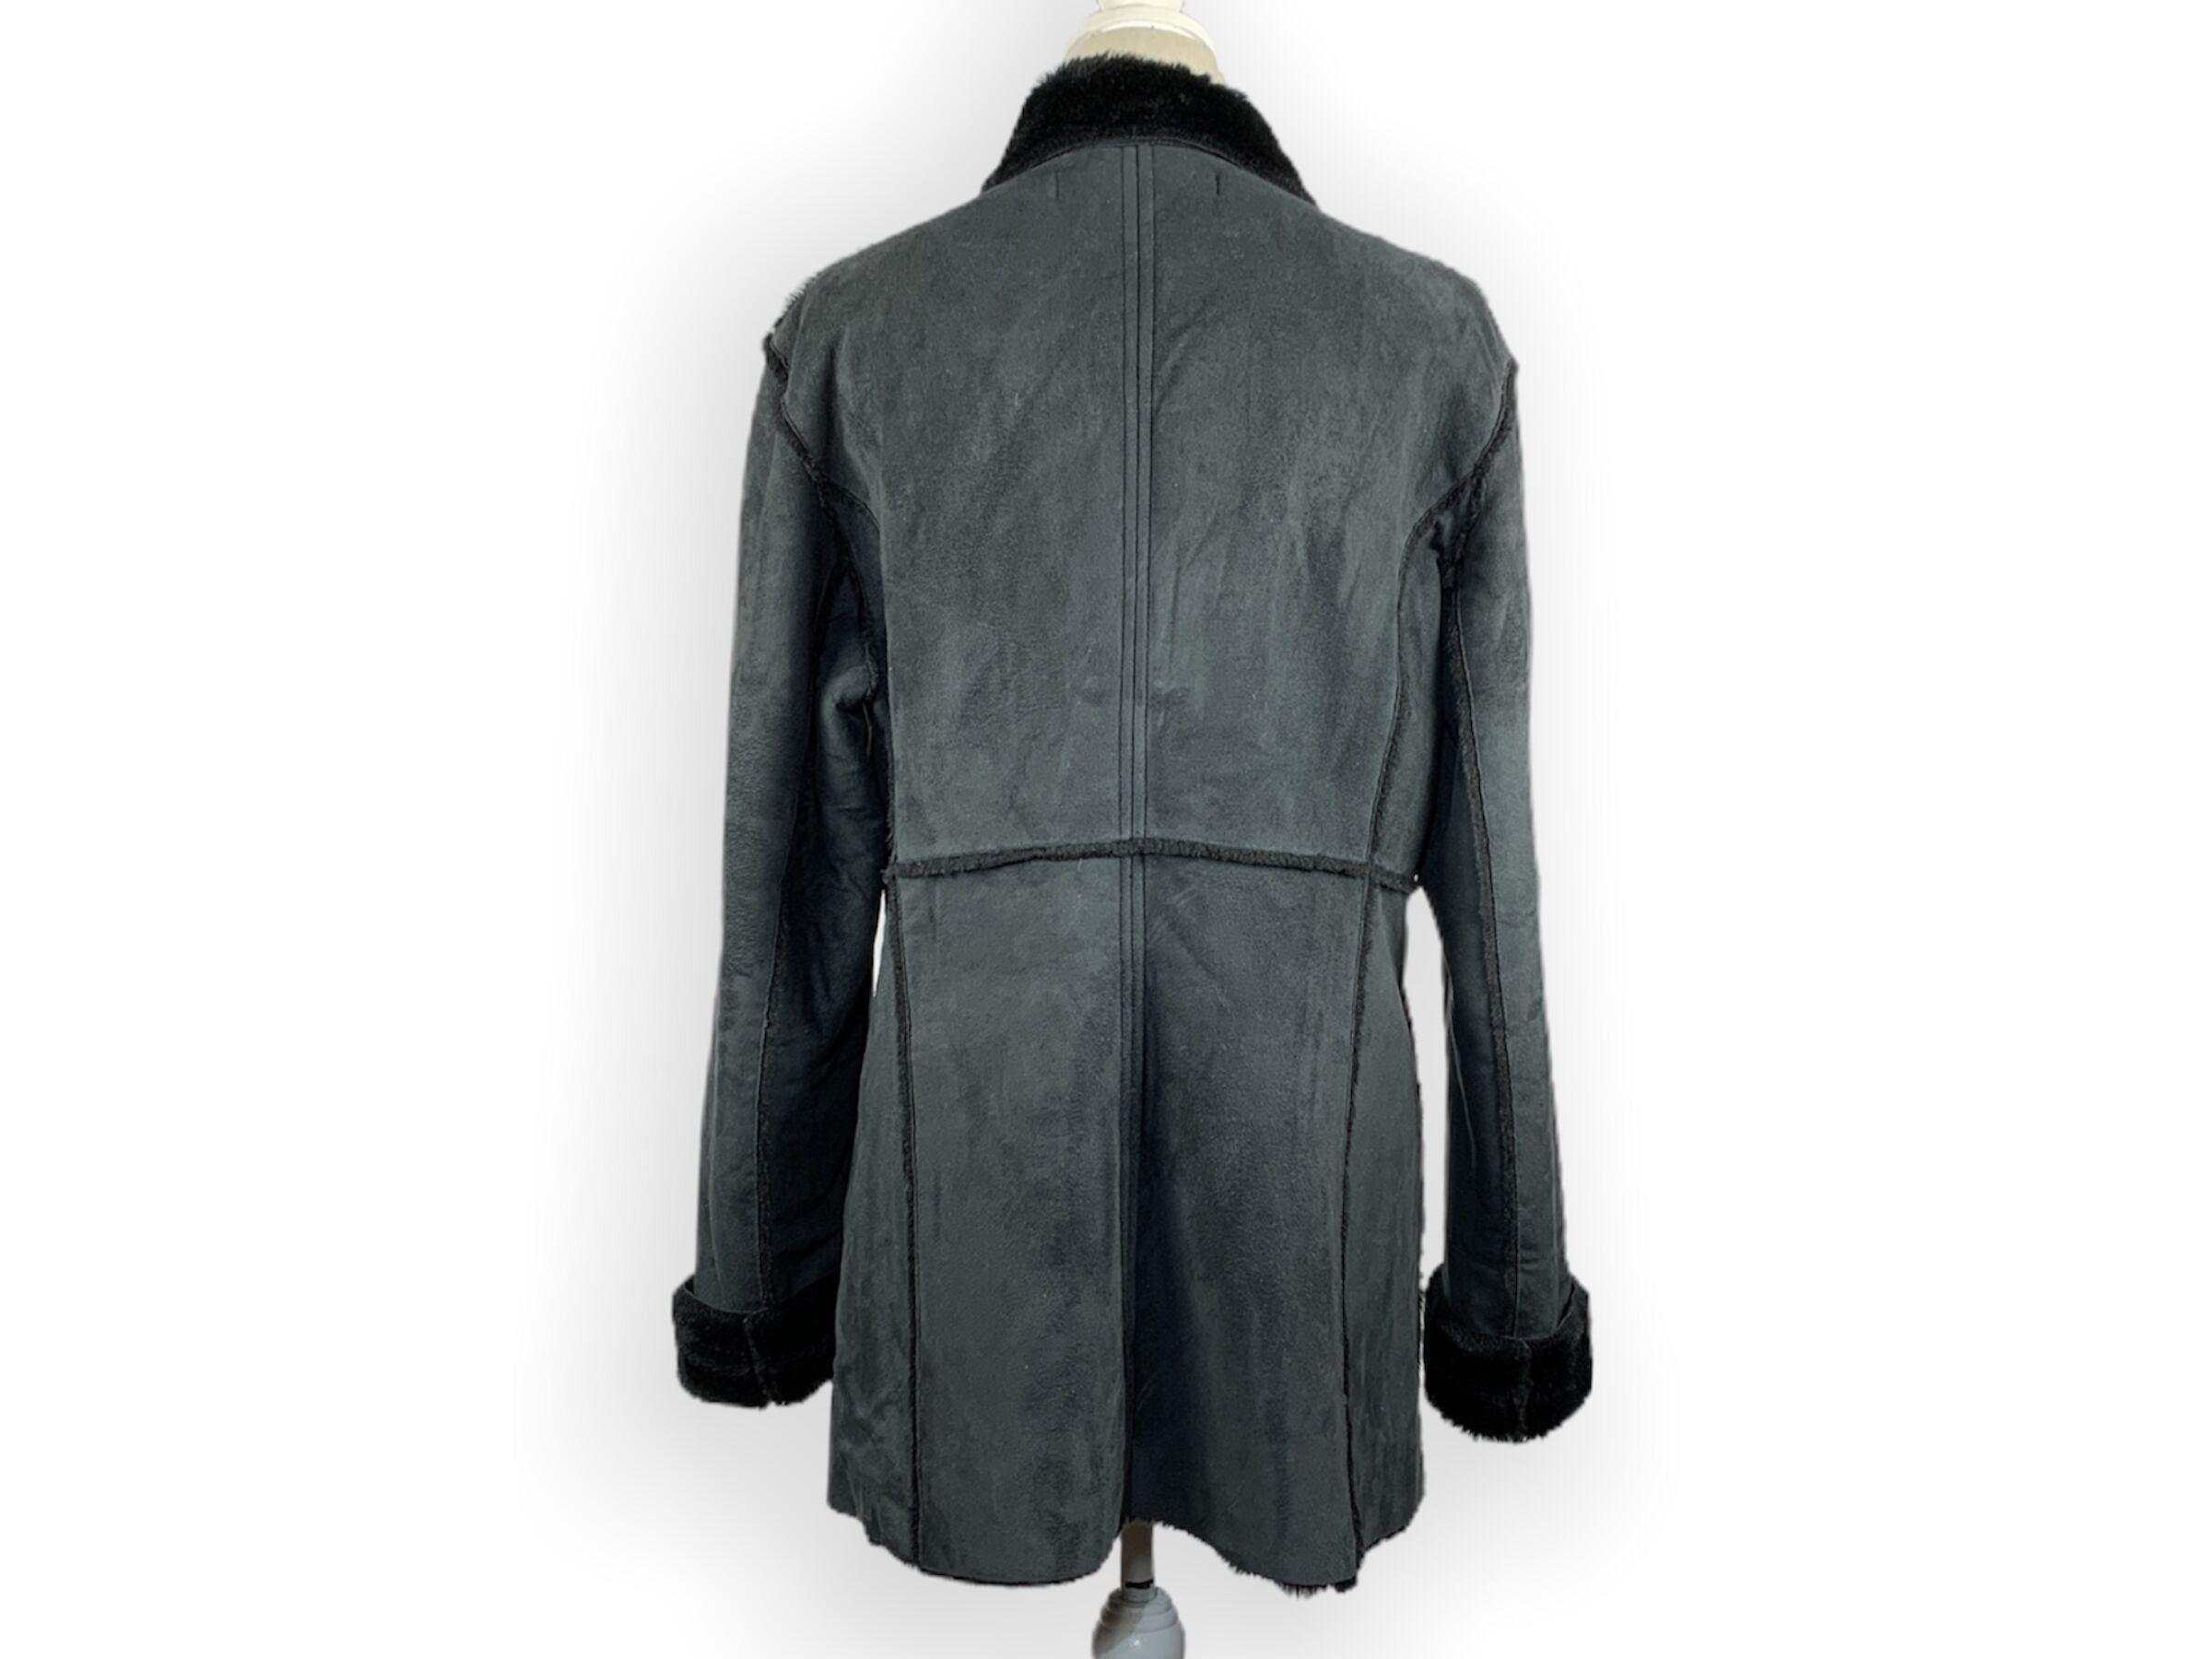 Guess kabát (XL)